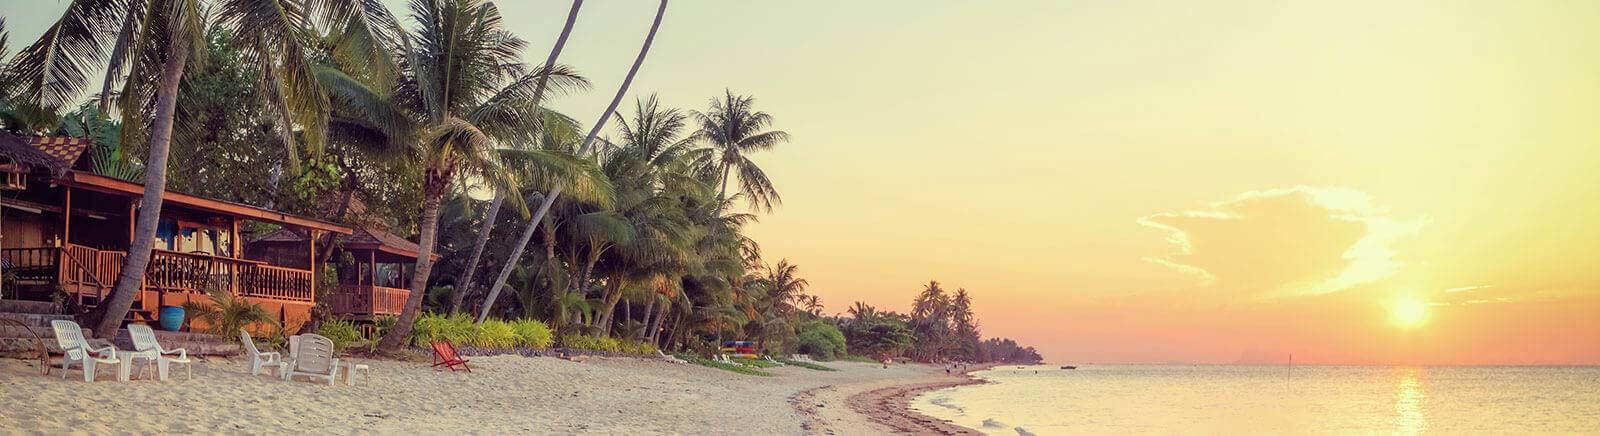 In & Around Goa